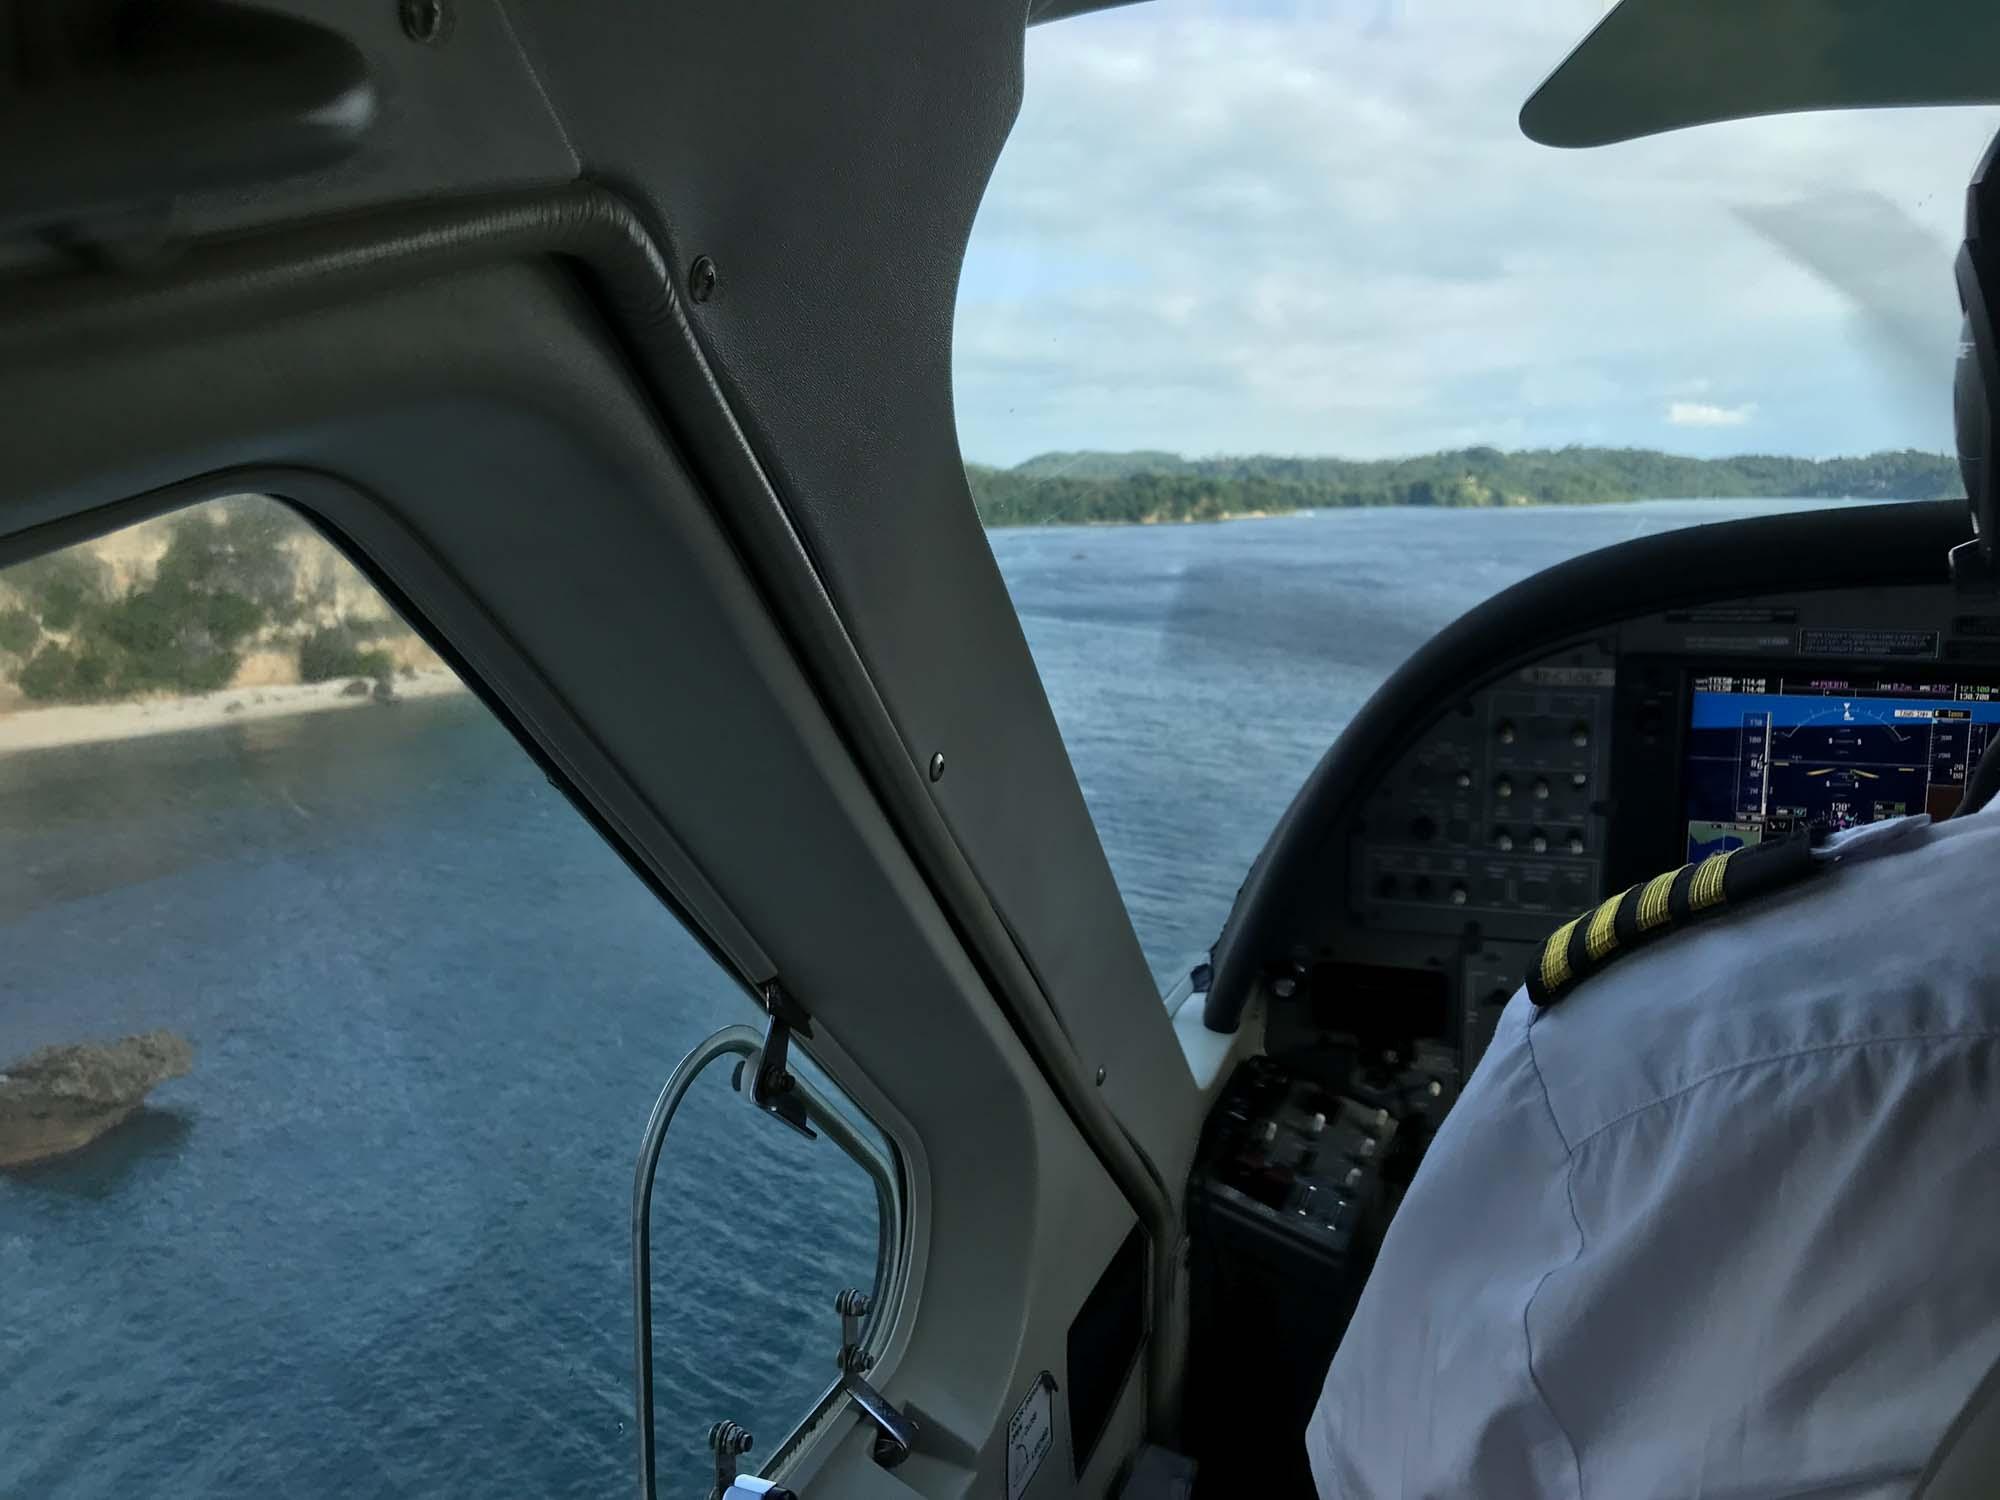 Air Juan Seaplane Inflight